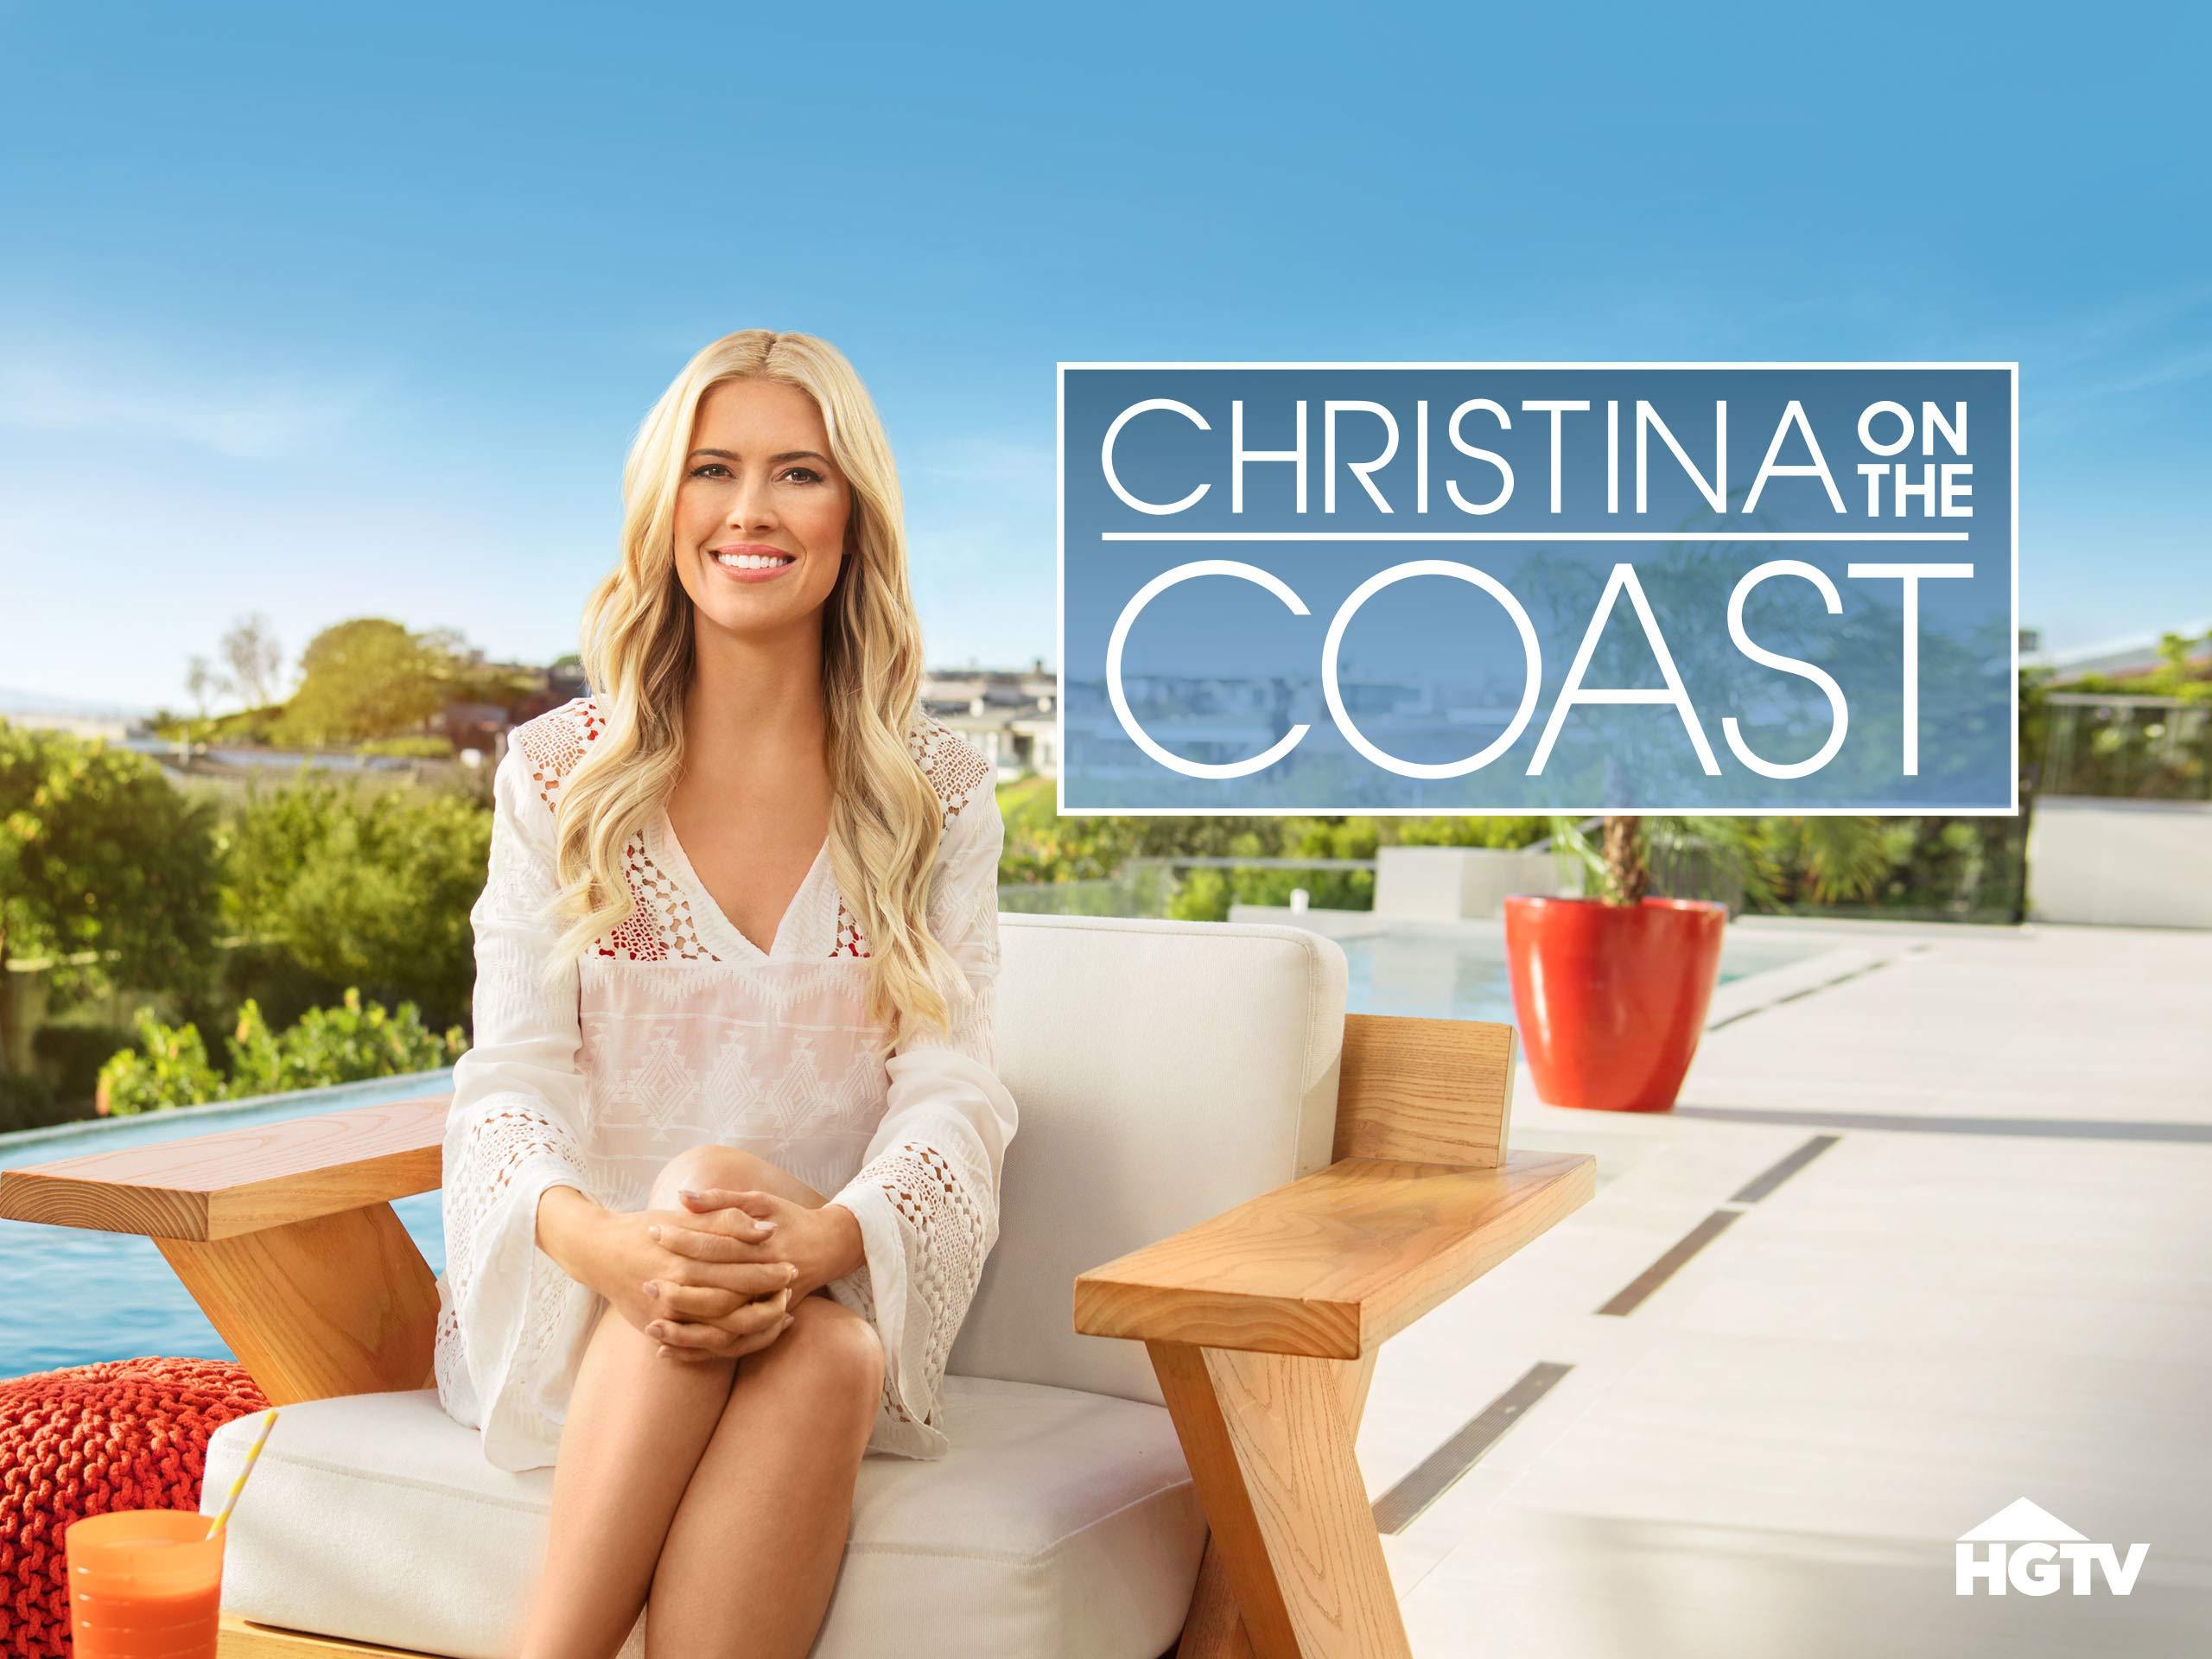 Where Is Christina On The Coast Filmed?